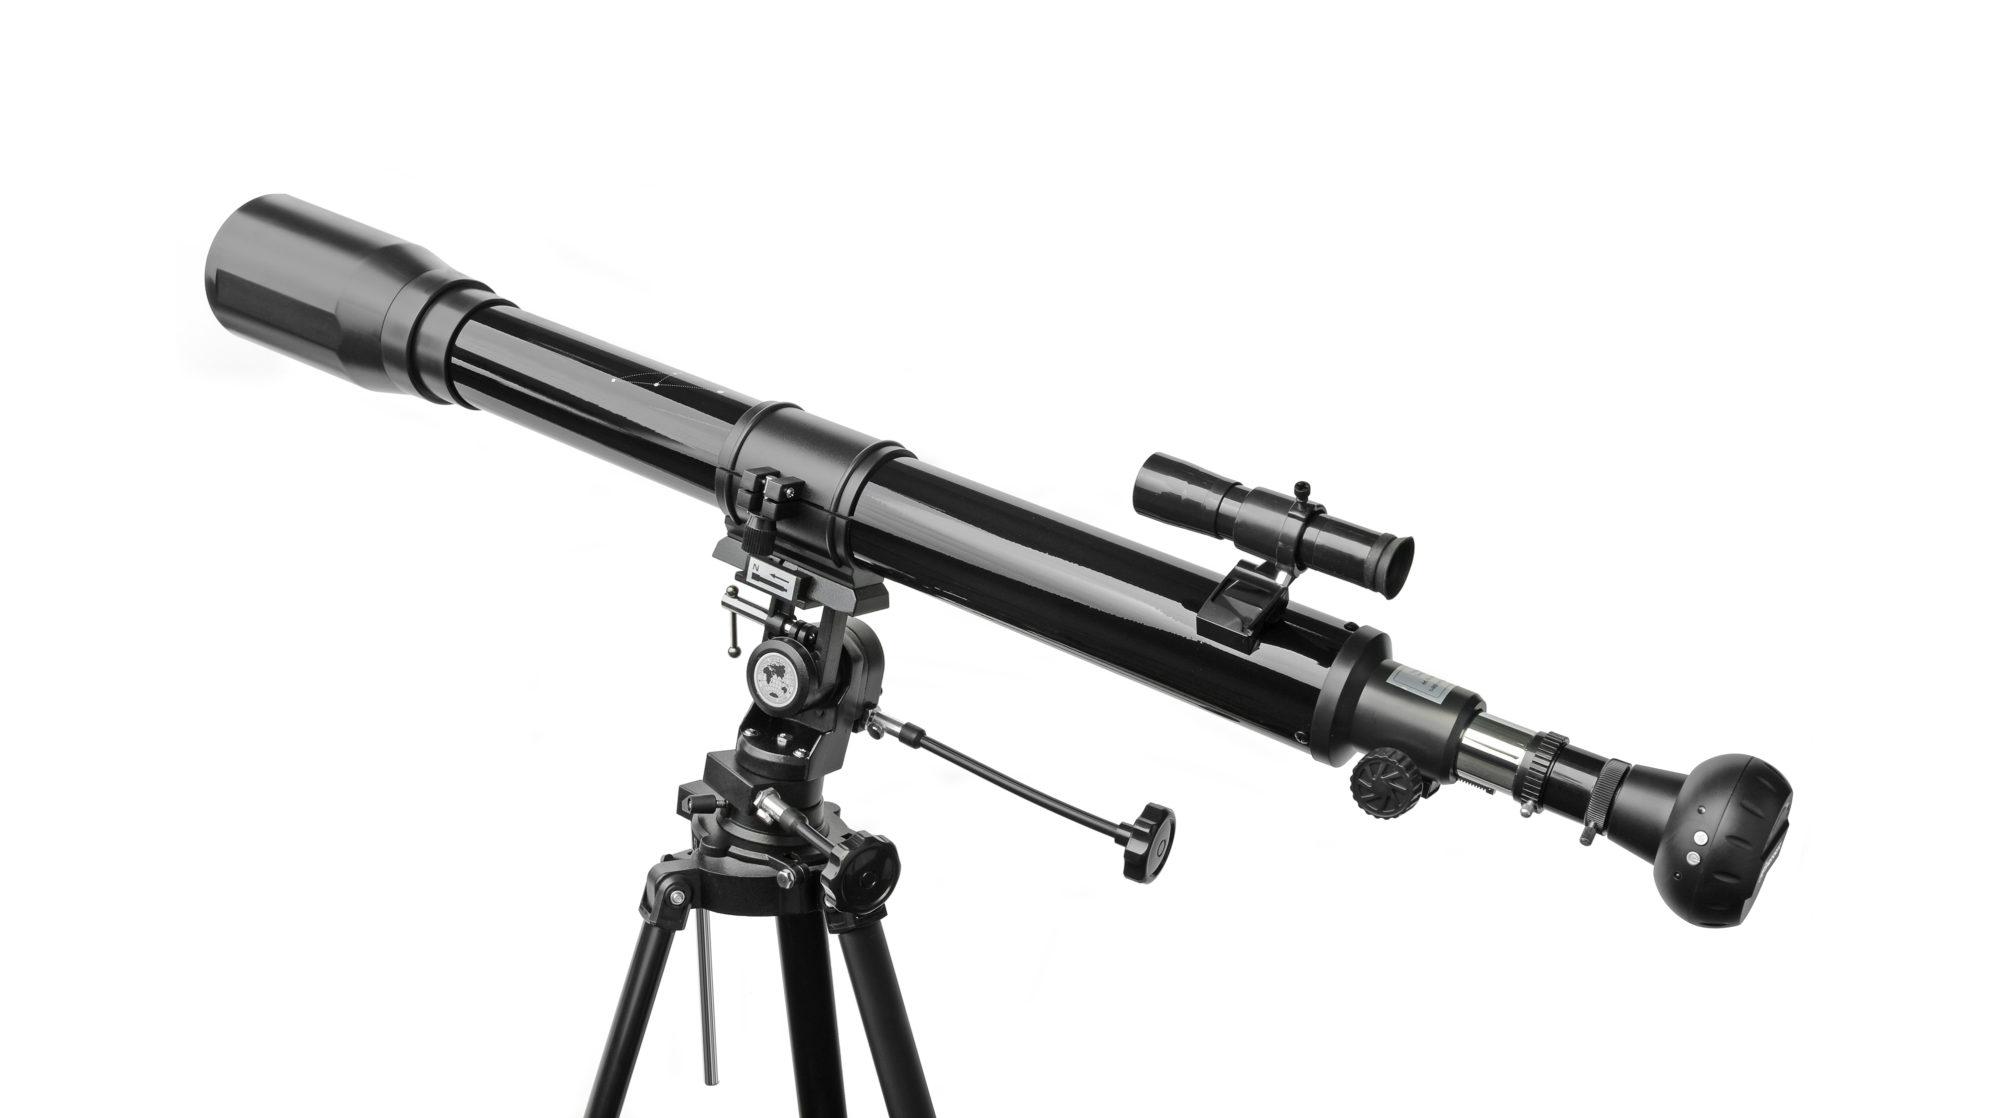 national geographic teleskop 70 900 mit wifi kamera hier online bestellen. Black Bedroom Furniture Sets. Home Design Ideas